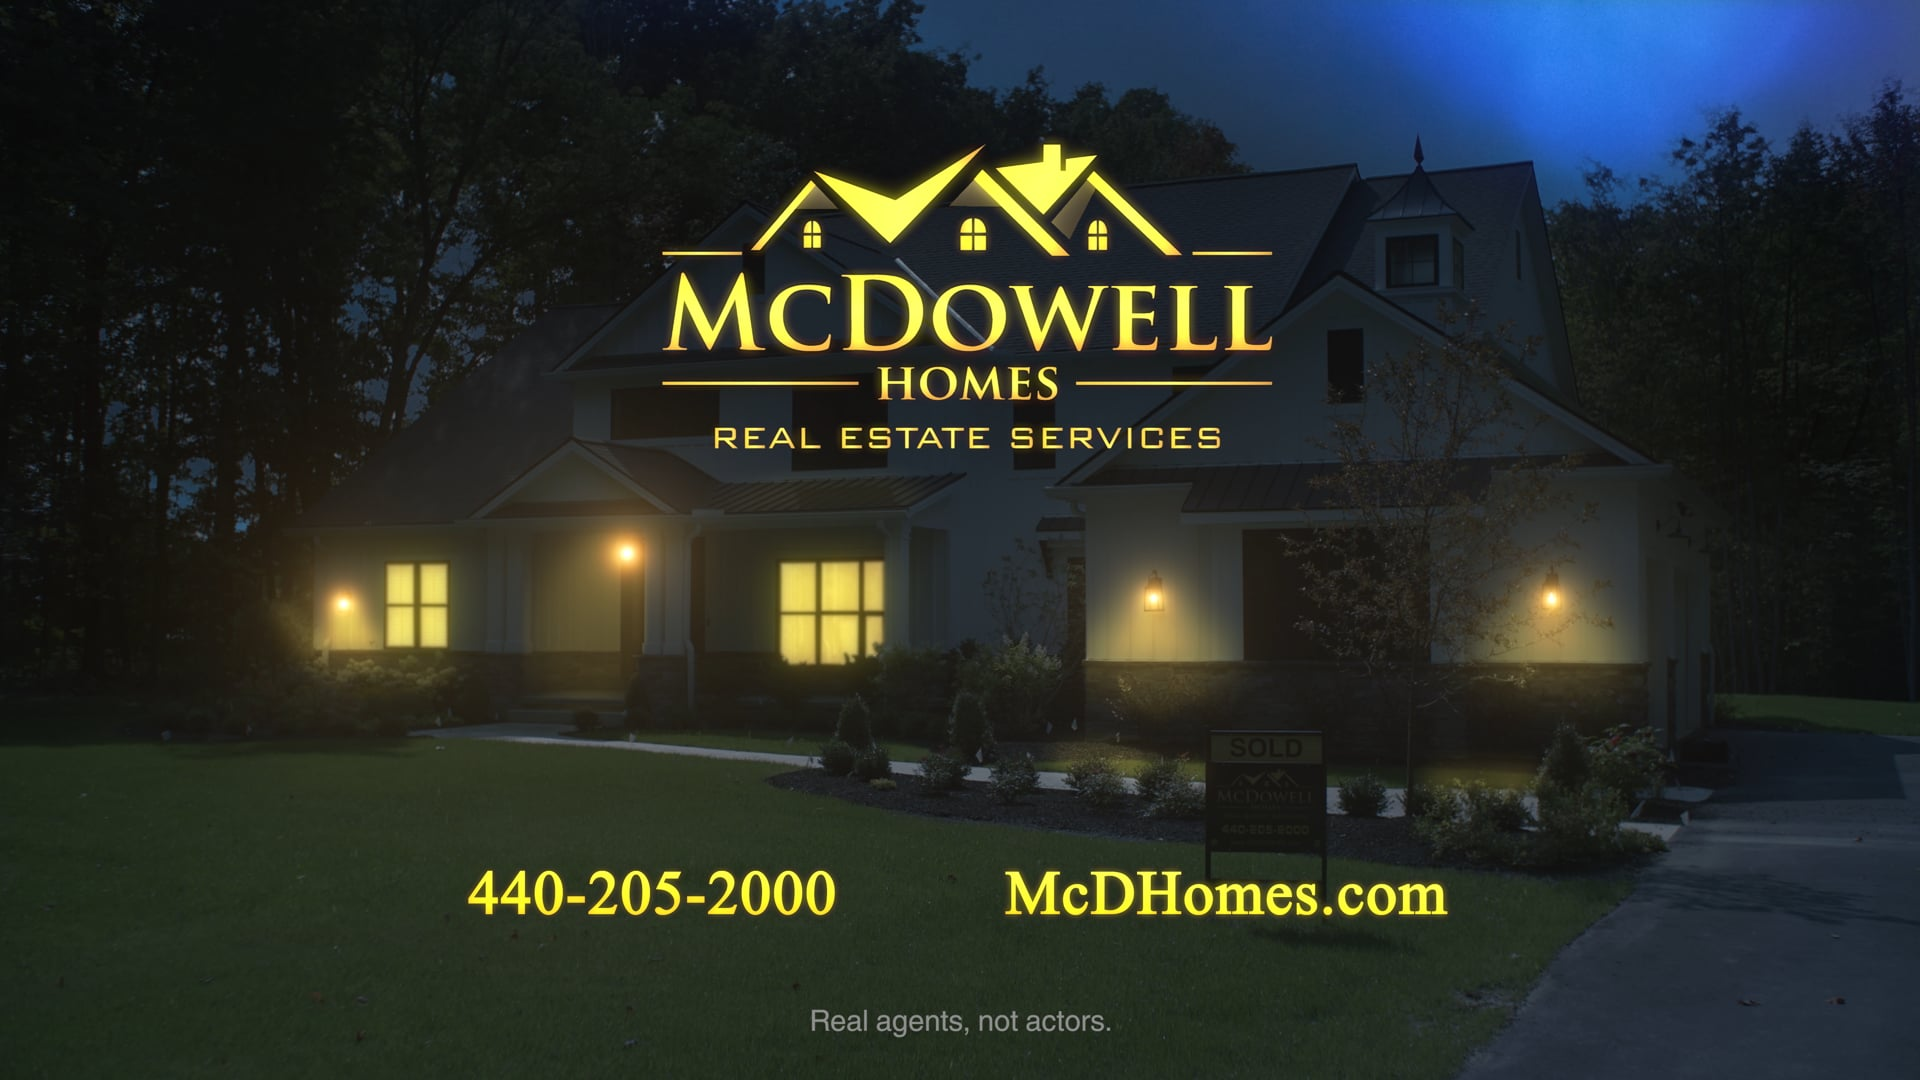 McDowell Homes - Hologram Homes